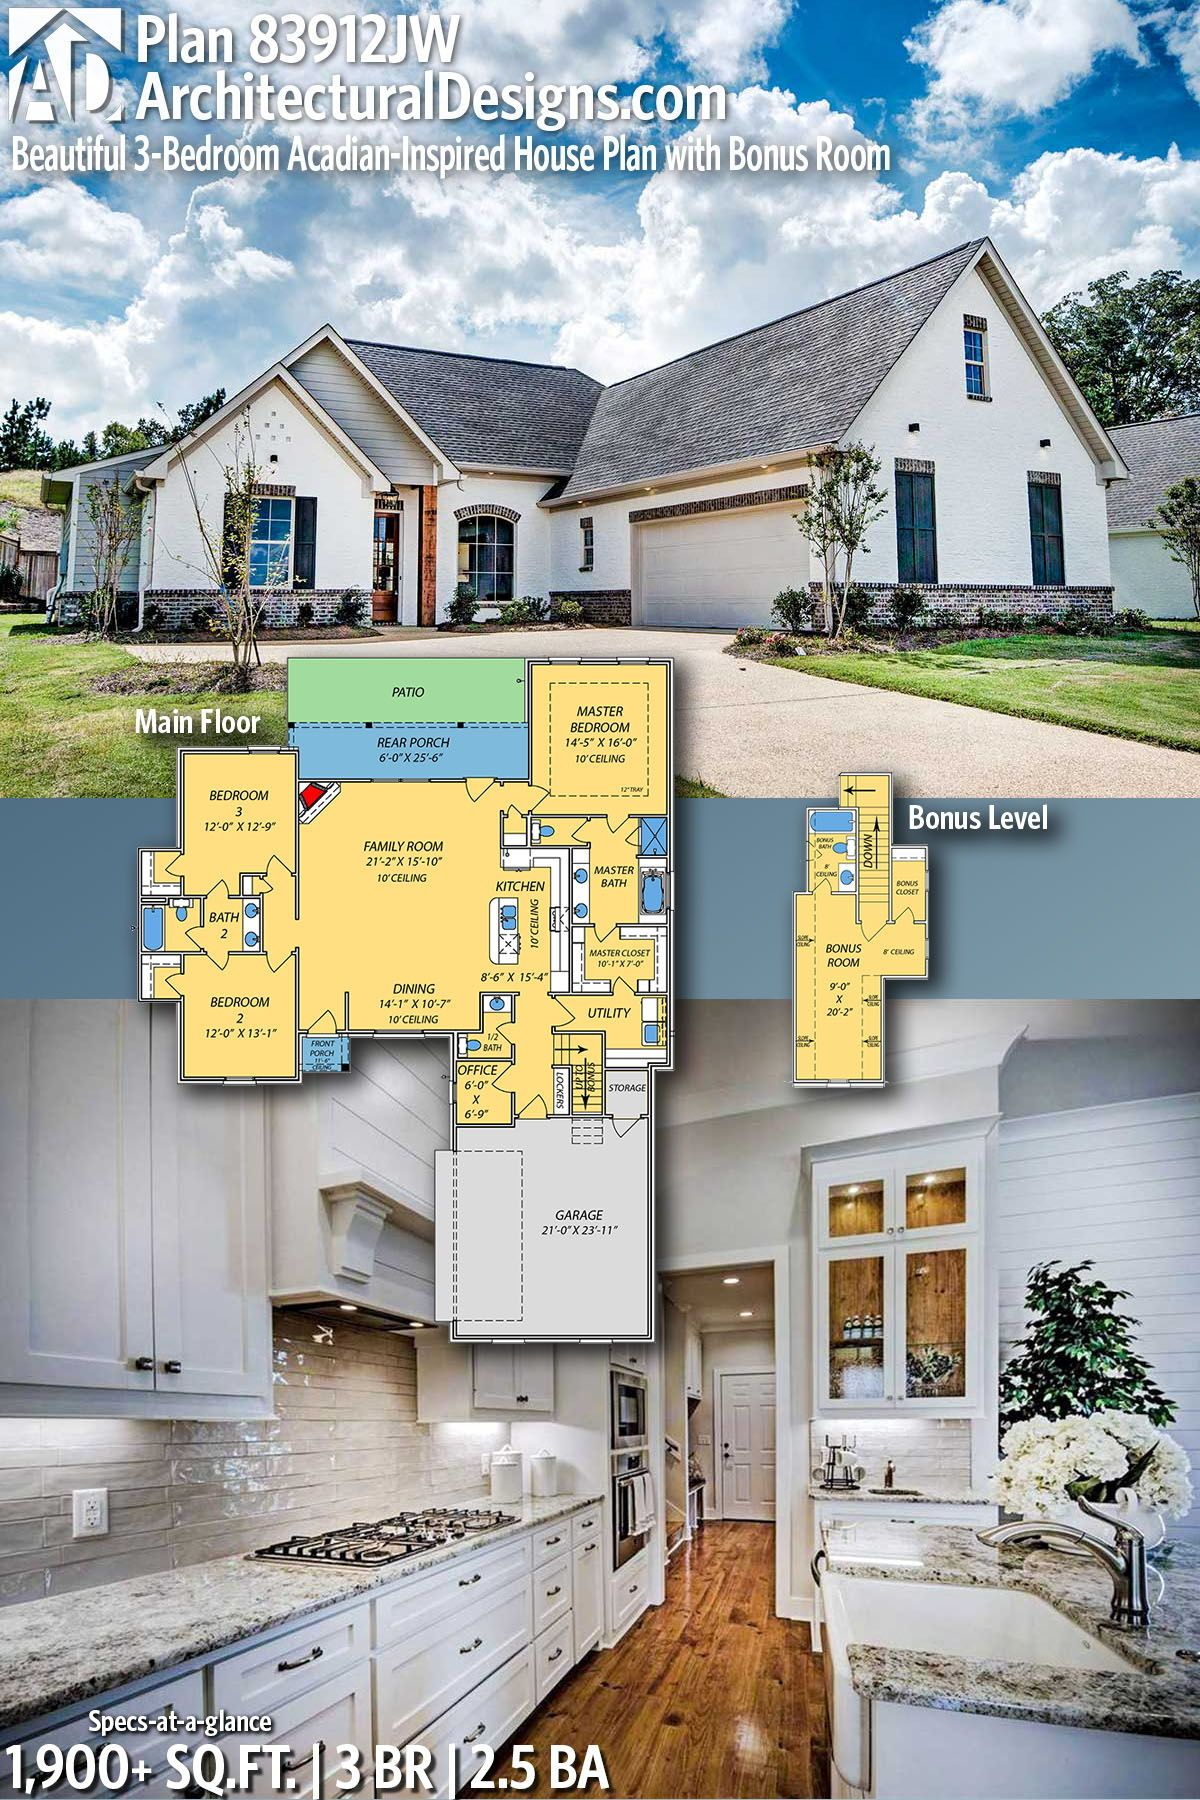 Plan 83912jw Beautiful 3 Bedroom Acadian Inspired House Plan With Bonus Room Acadian House Plans Craftsman House Plans Ranch House Plans